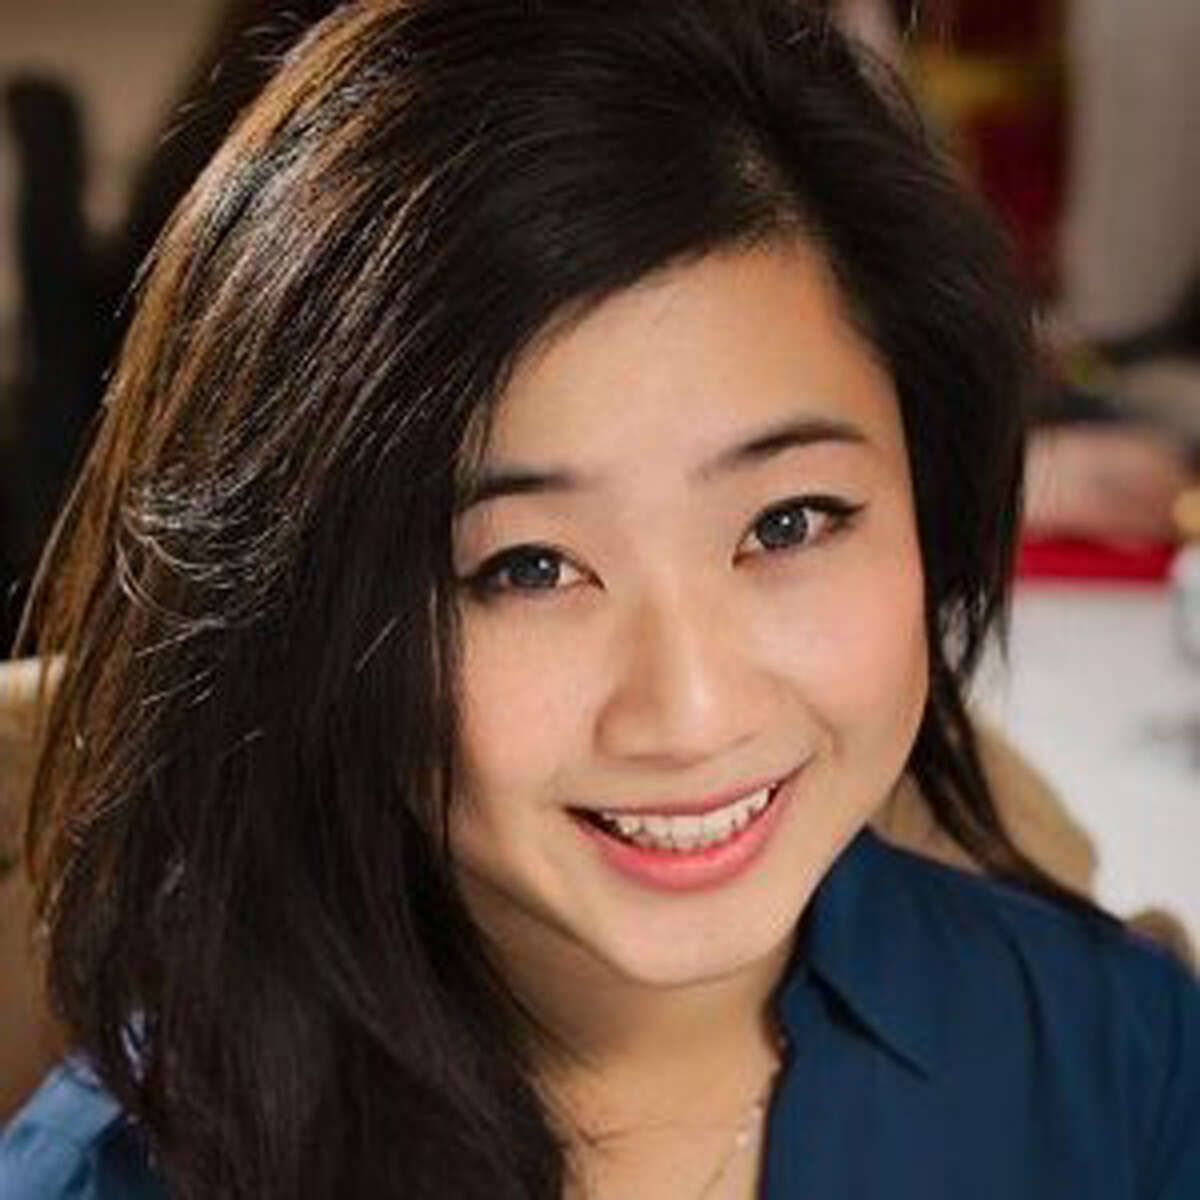 Vivian Ziwei Guan, 20, was a Rice University architectural student.